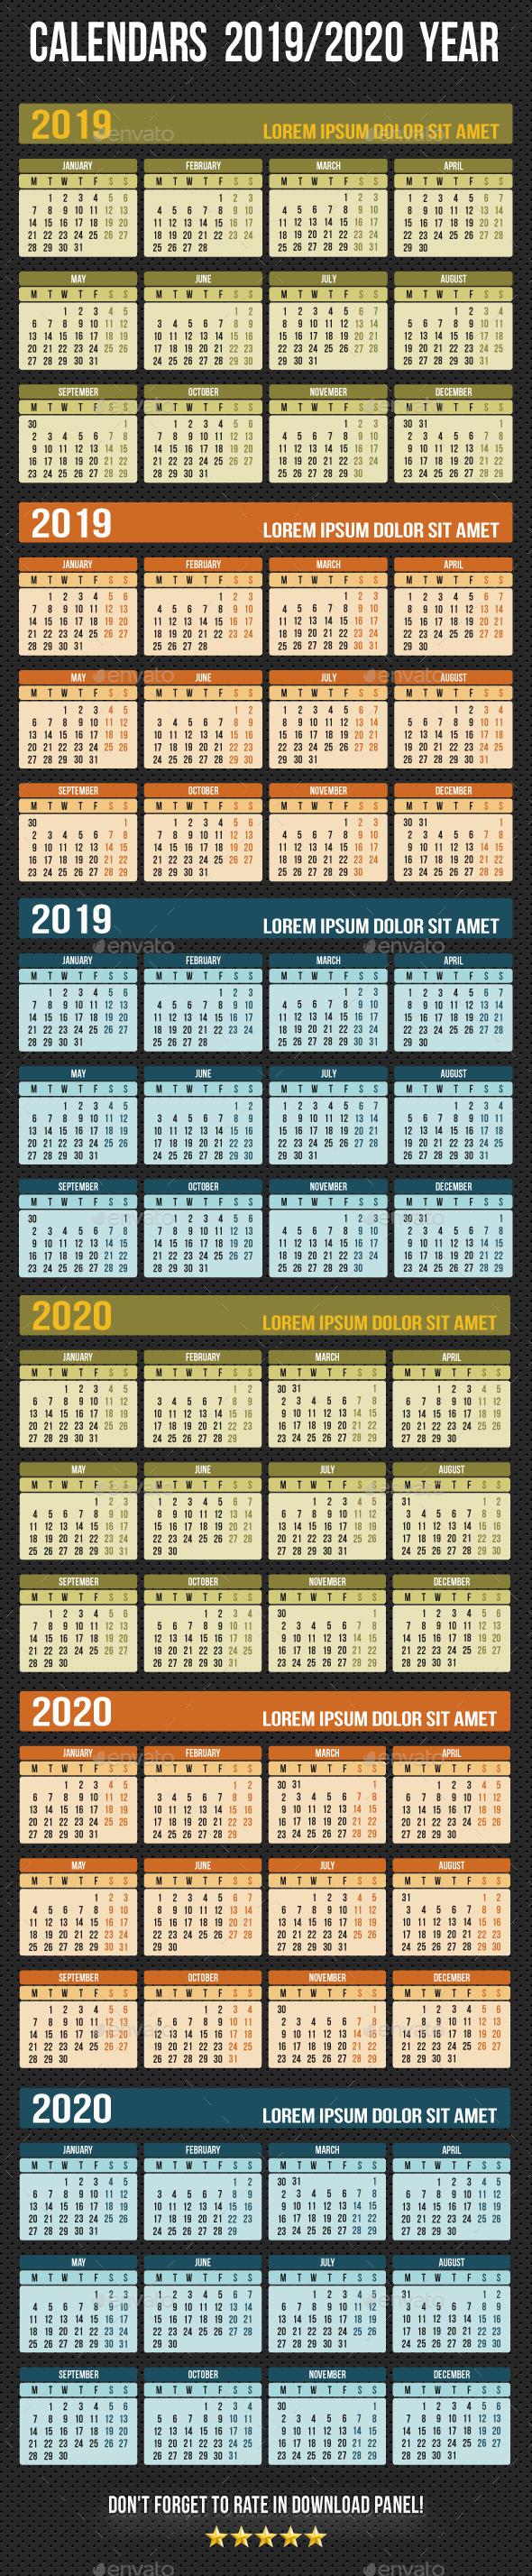 Calendars 2019 - 2020 Year - Miscellaneous Vectors